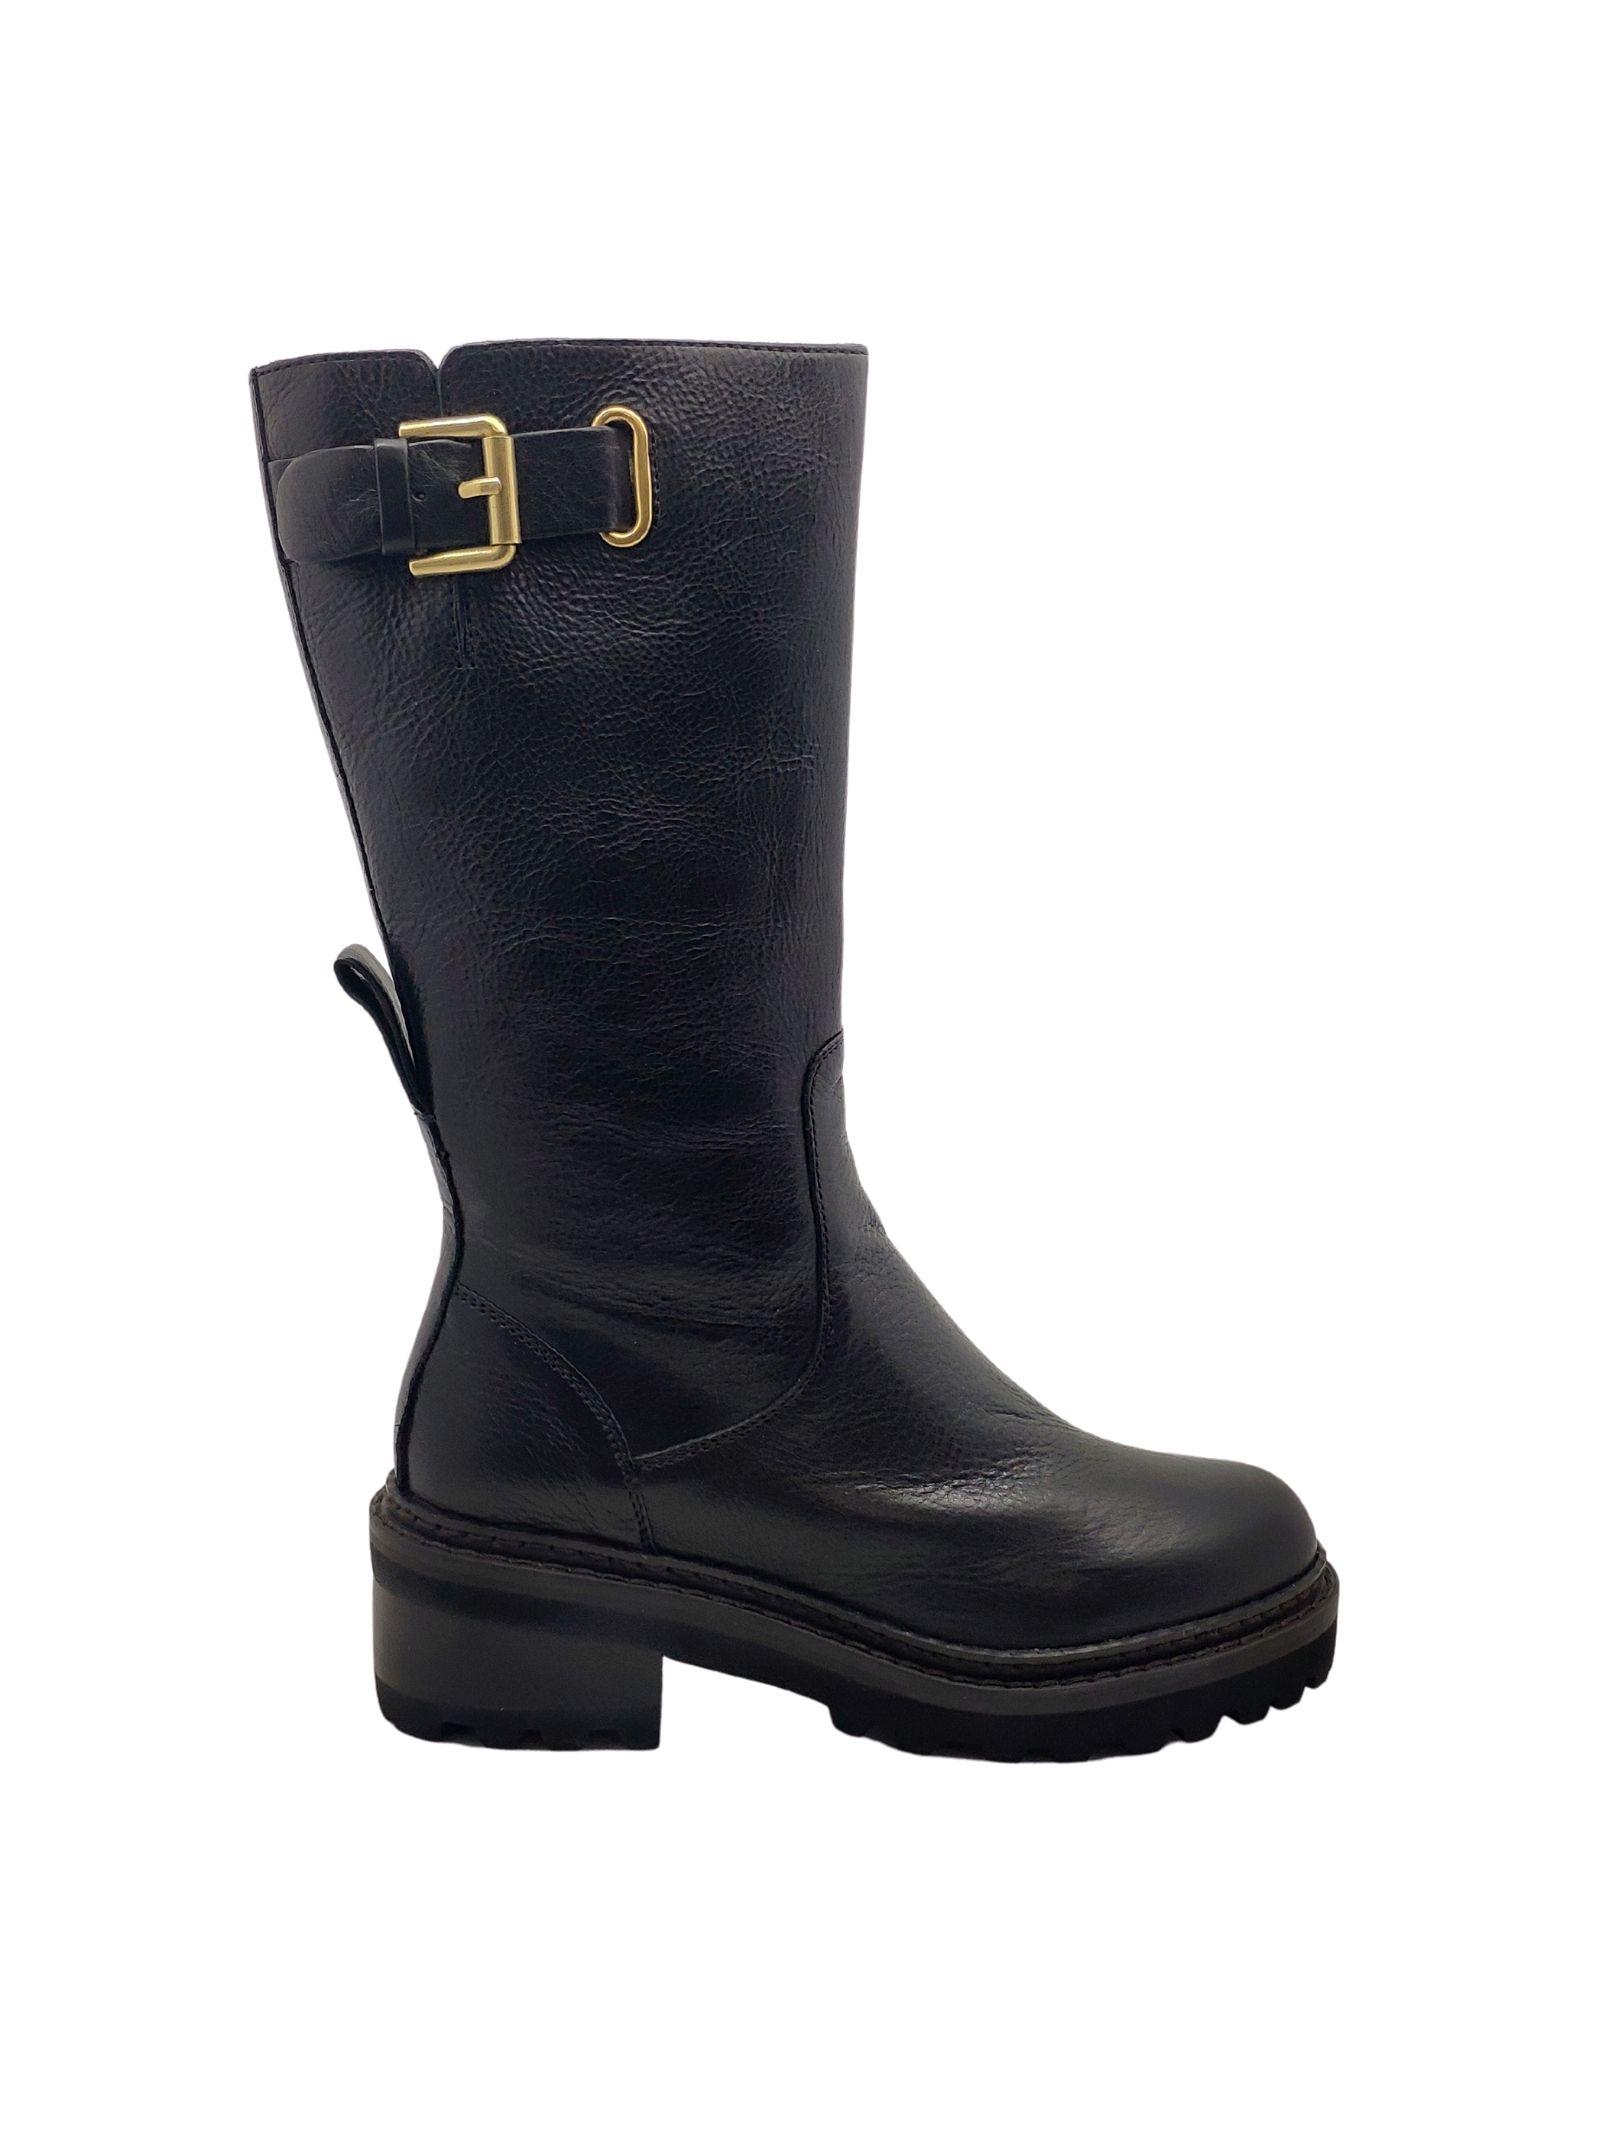 Women's Amphibious Boots Prime By Bruno Premi   Ankle Boots   BA1304PNERO